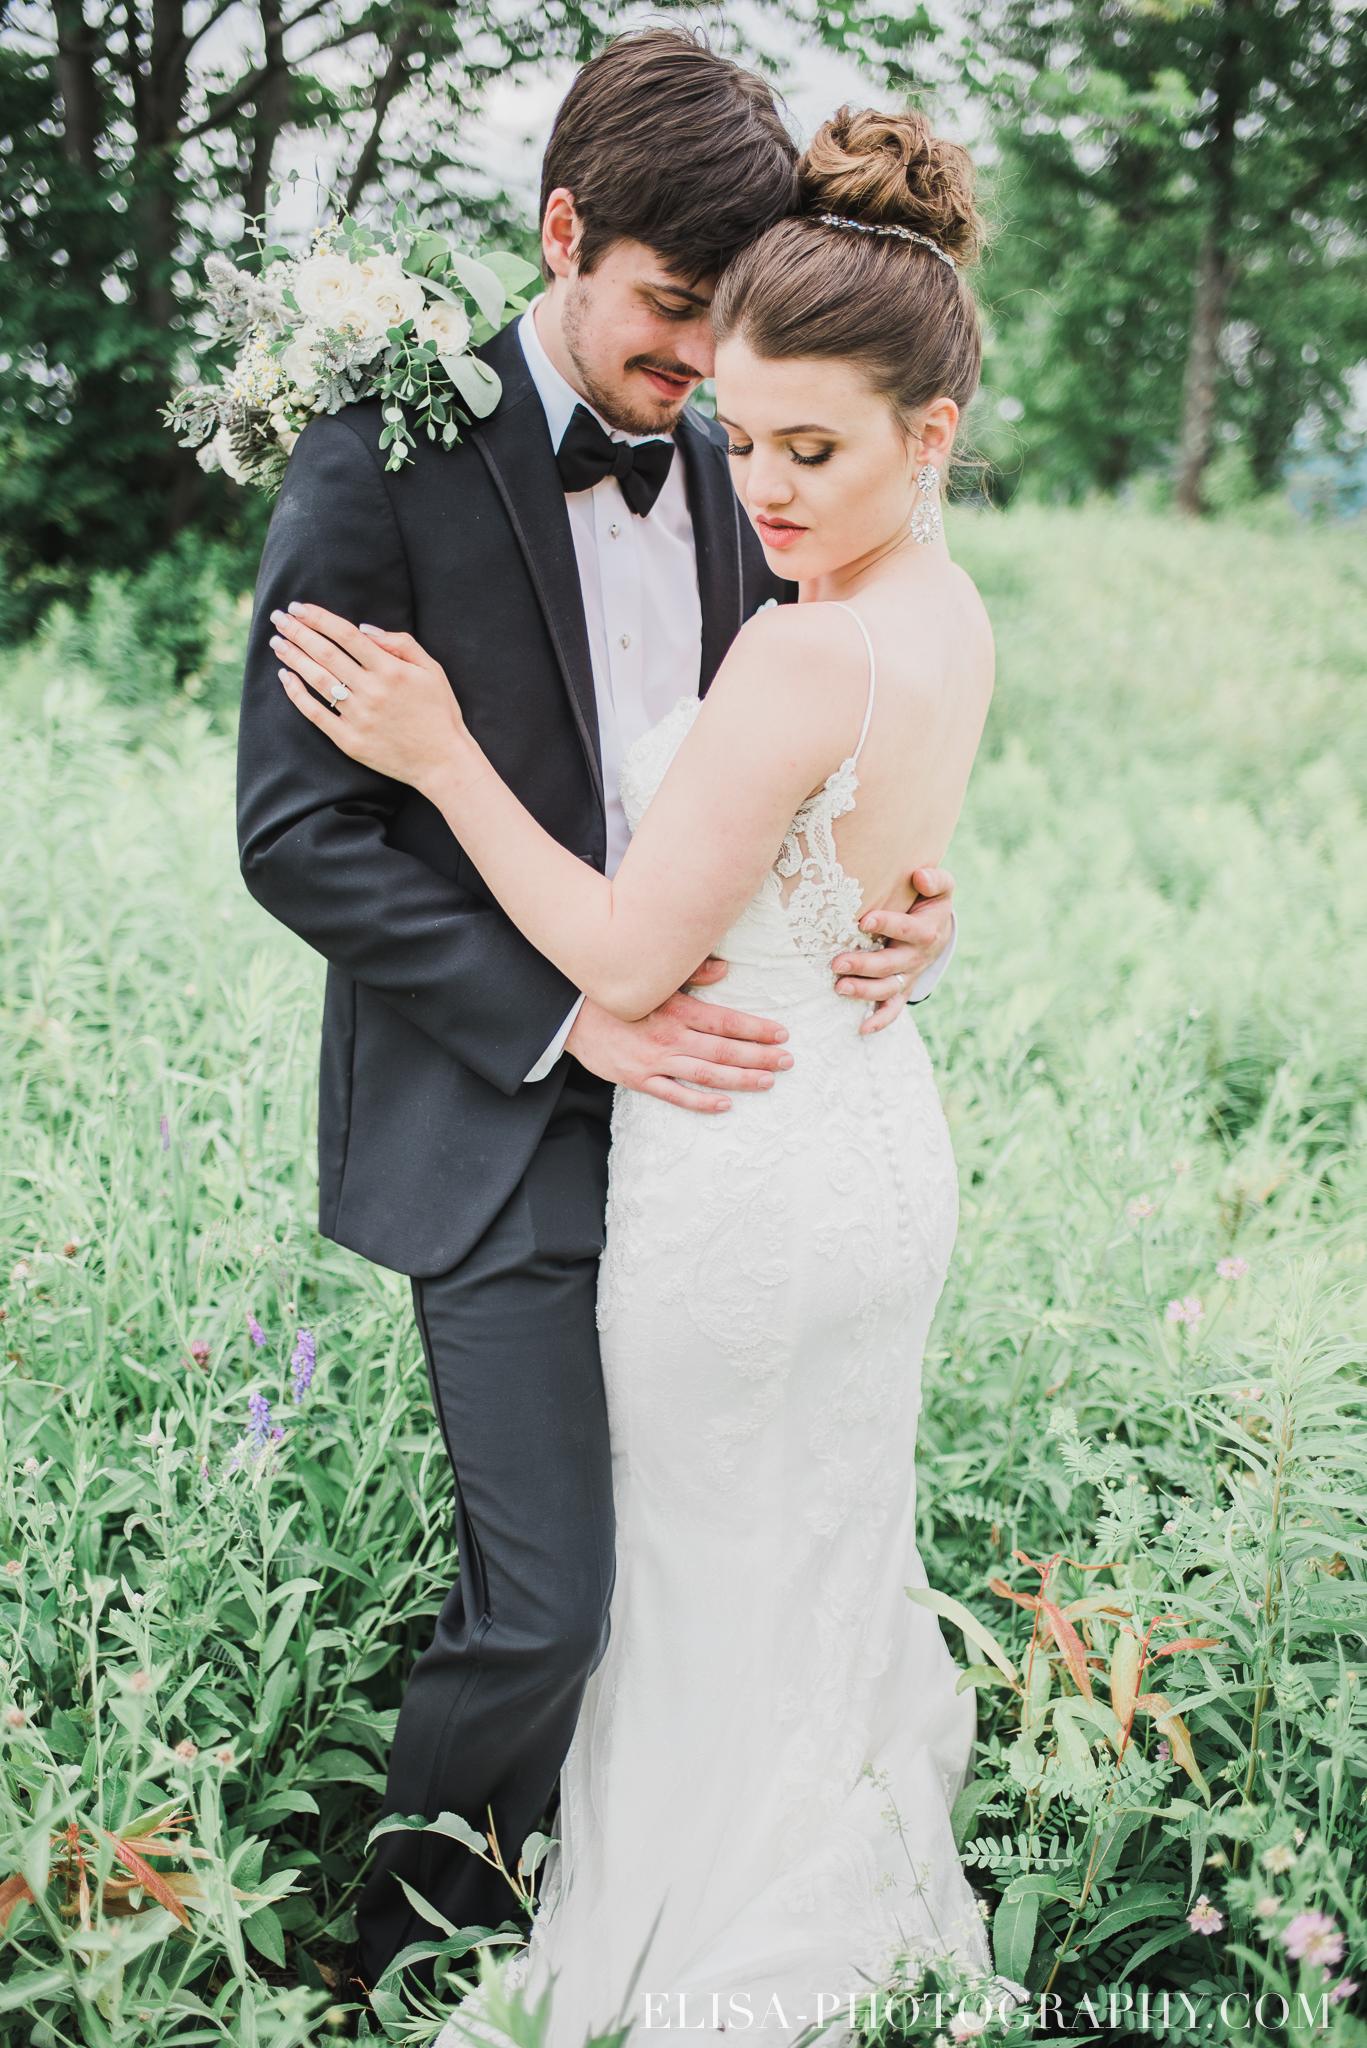 photo mariage a la montagne domaine tomali maniatin portrait couple lifestyle naturel lumineux professionel 6274 - Mariage à la montagne au domaine Tomali-Maniatyn